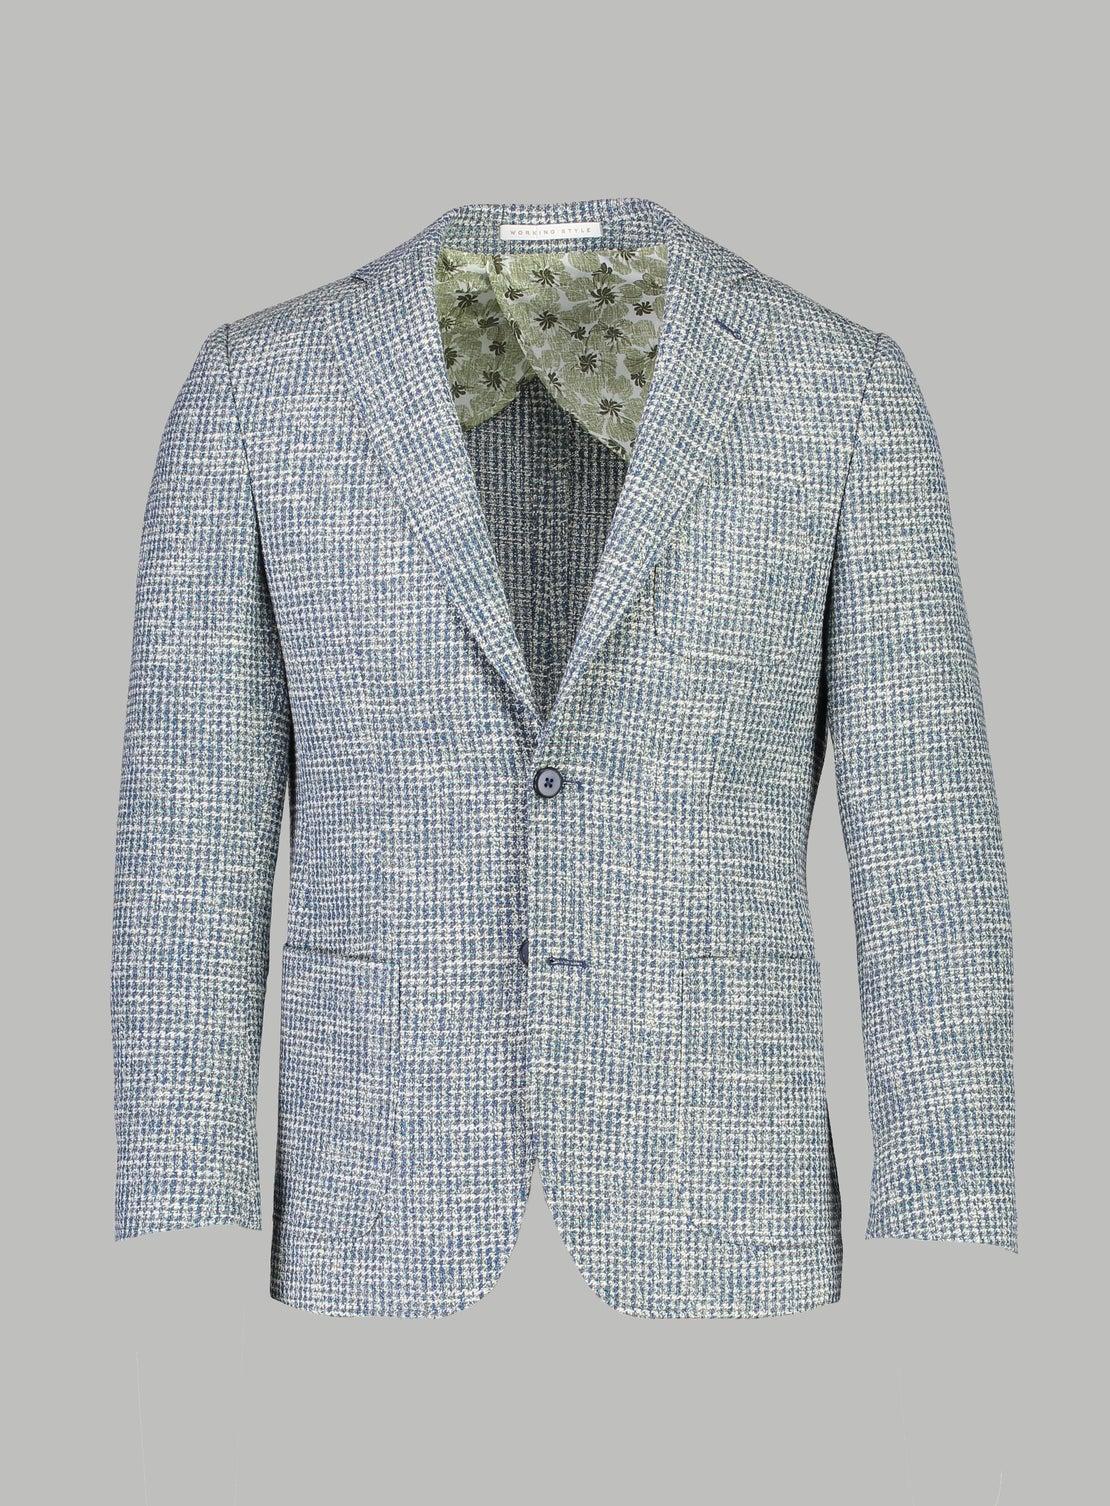 Lewis Navy & Cream Sportscoat